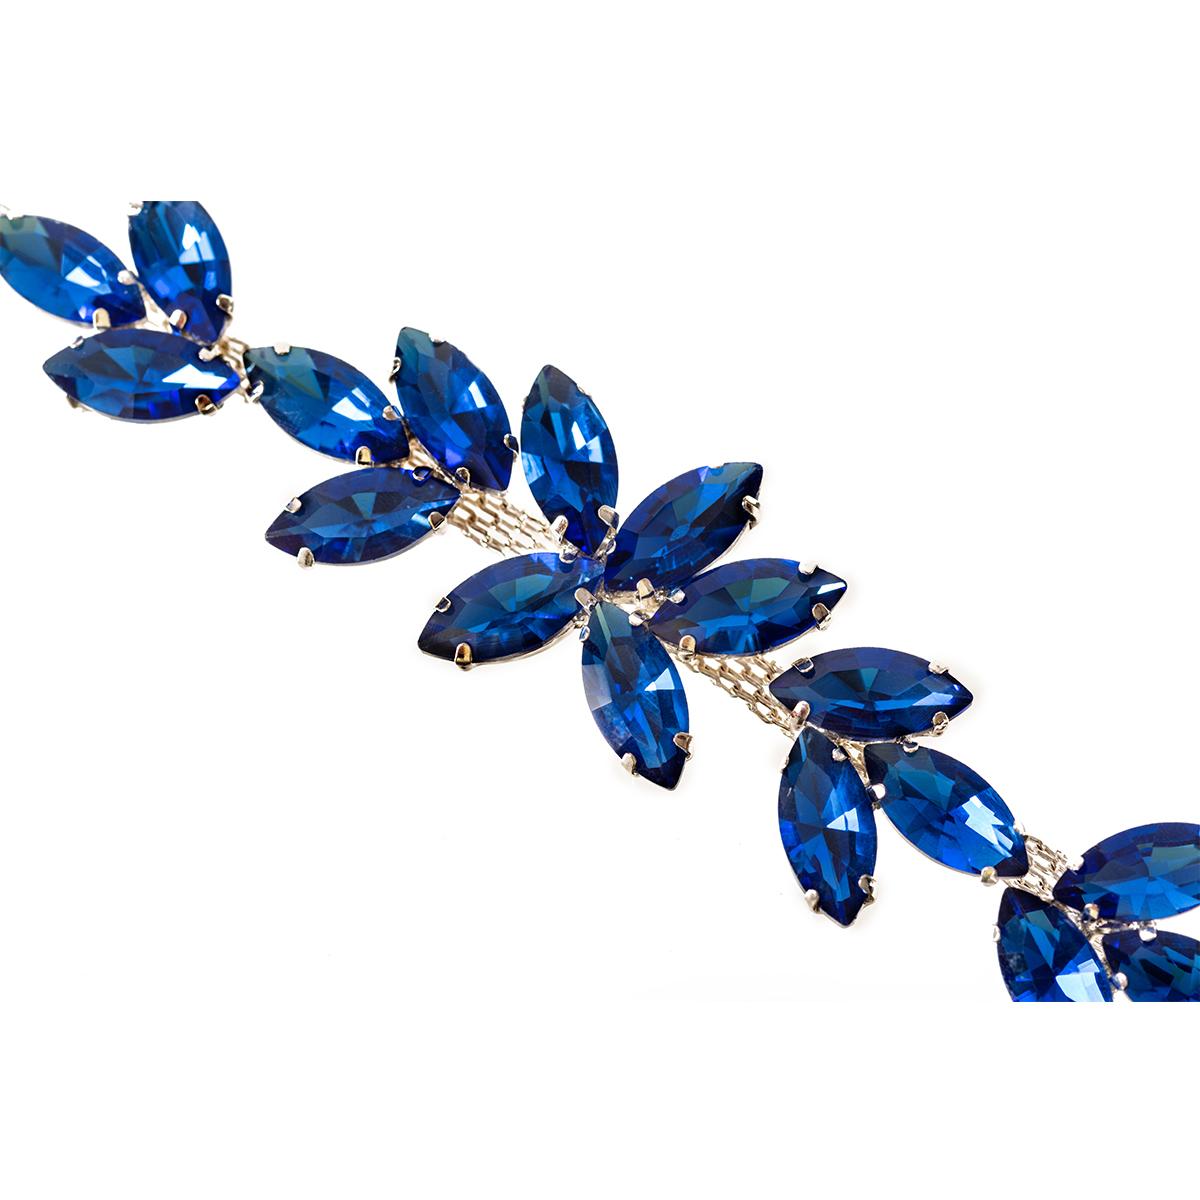 Rhinestone-Diamante-Motif-Applique-Sew-on-Crystal-Patch-for-Wedding-Bridal-Dress thumbnail 27